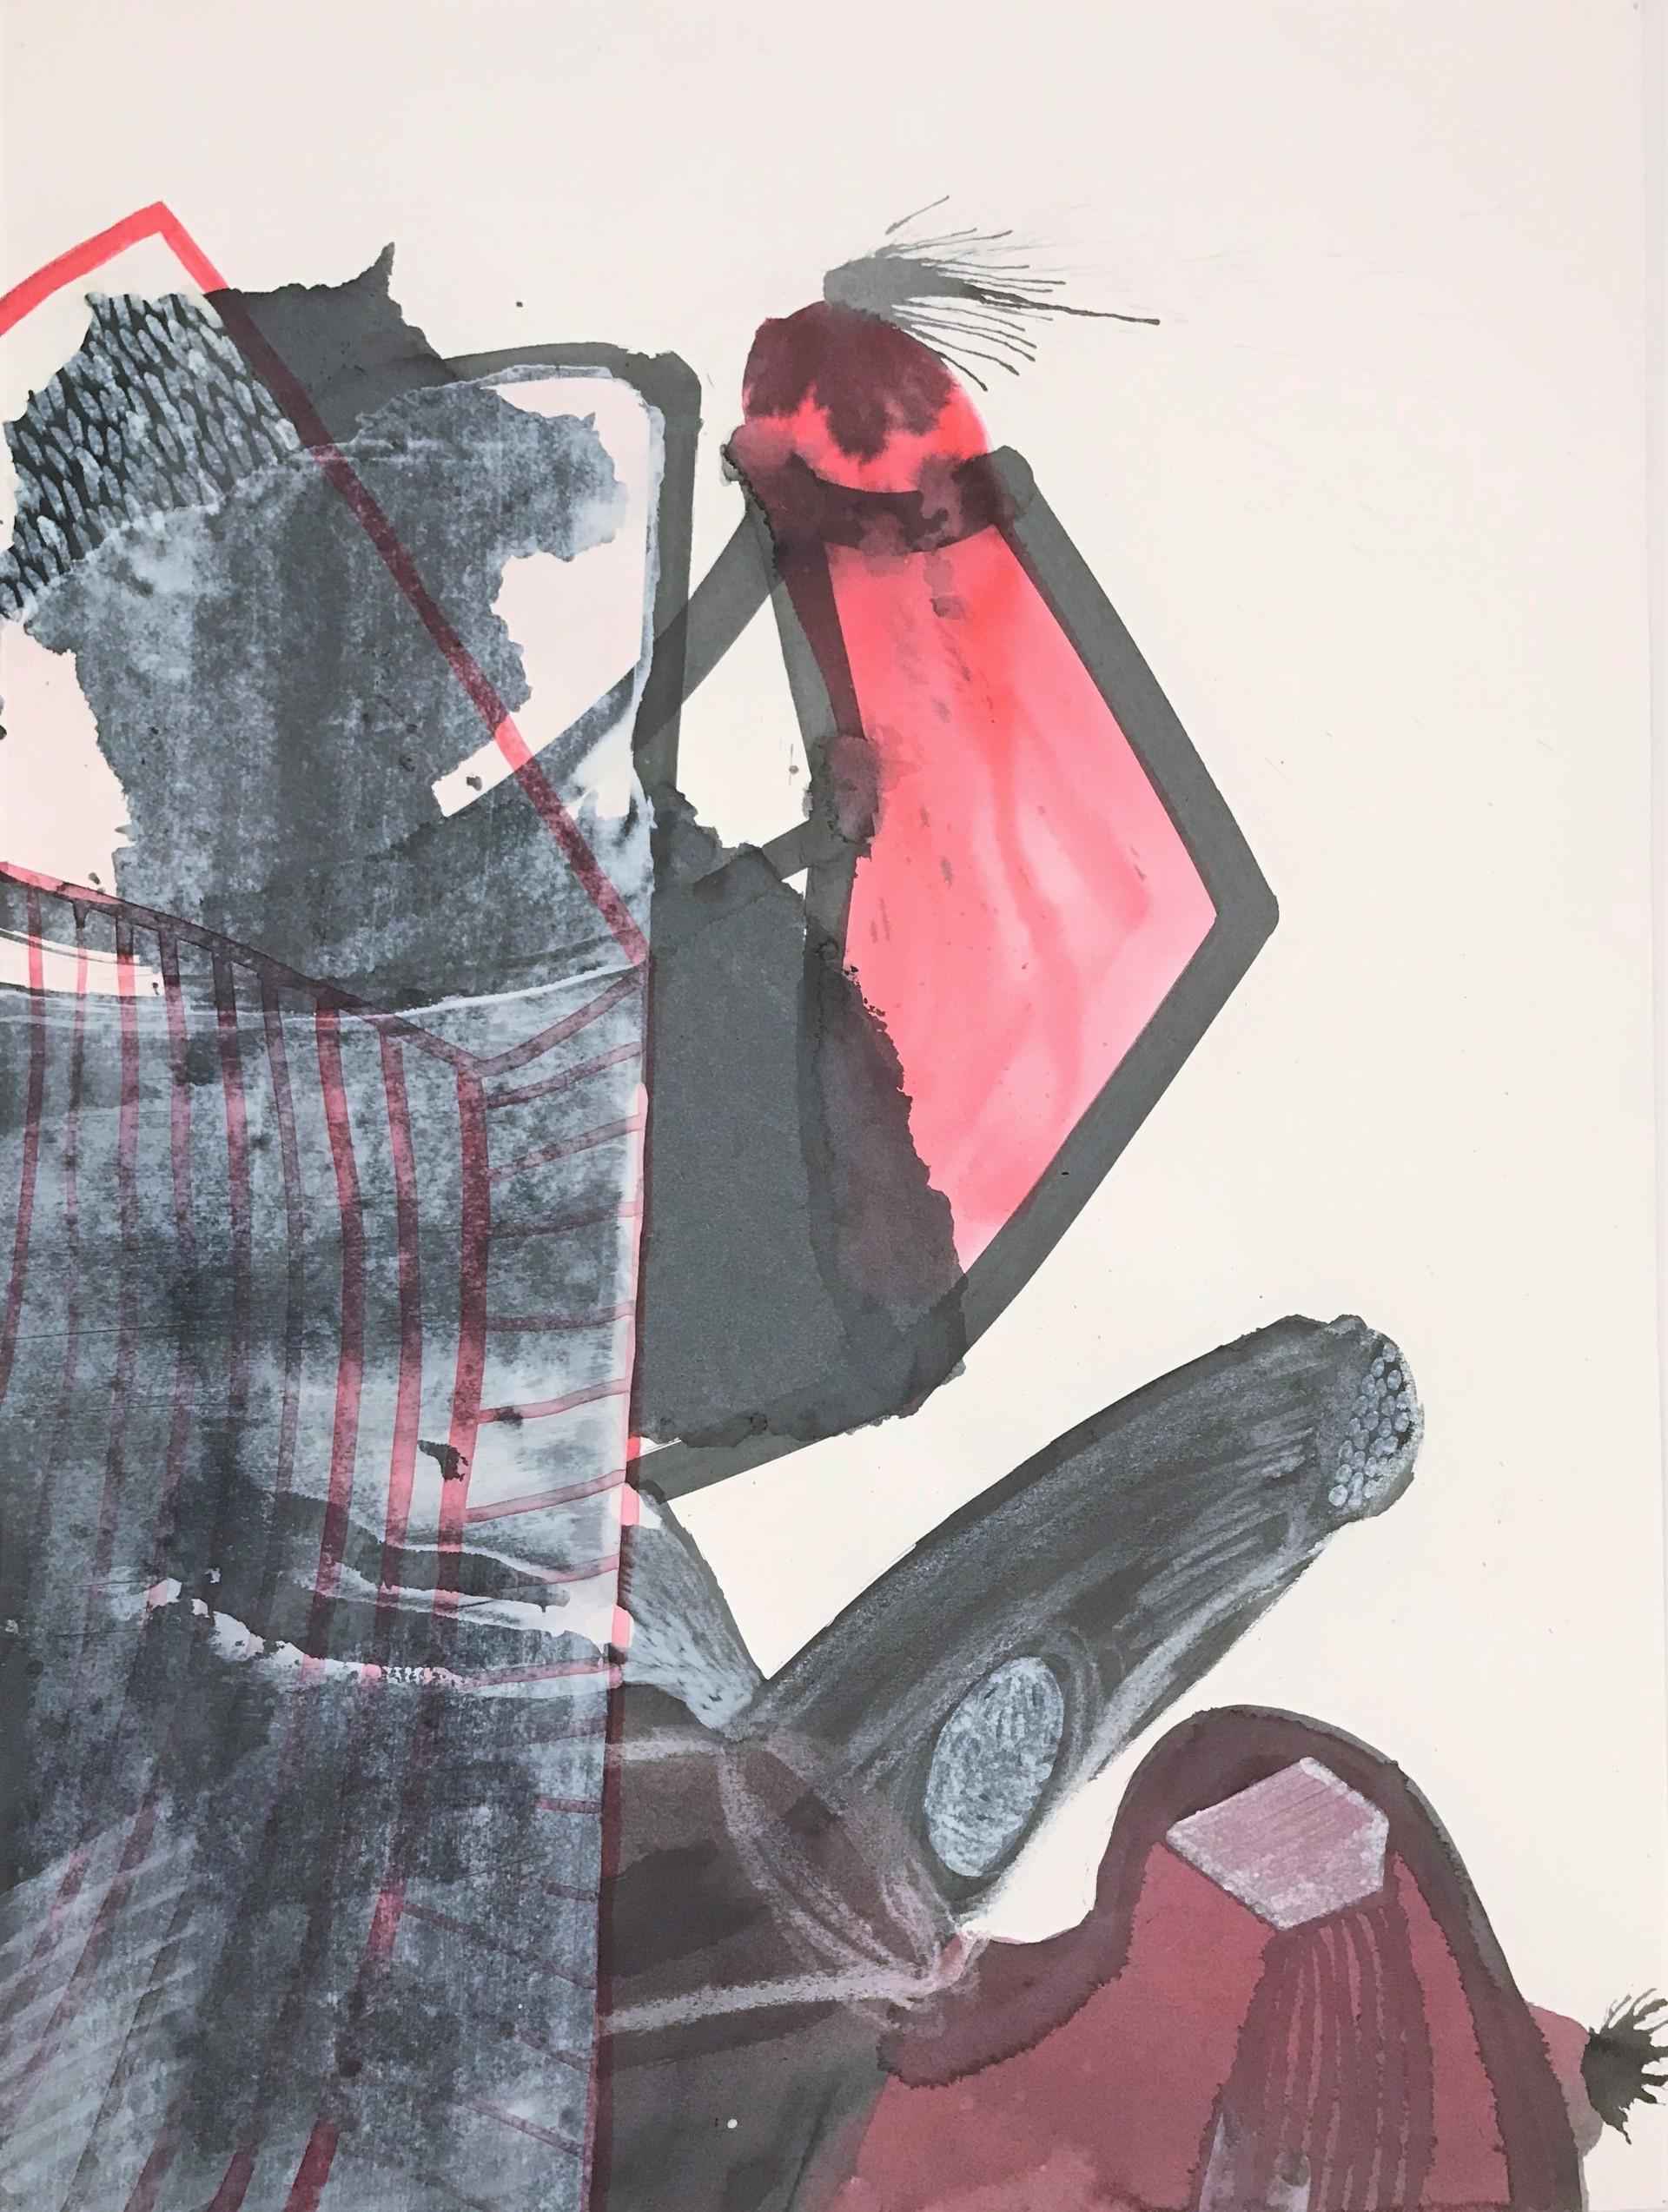 Up/Down by Edgard Camacho